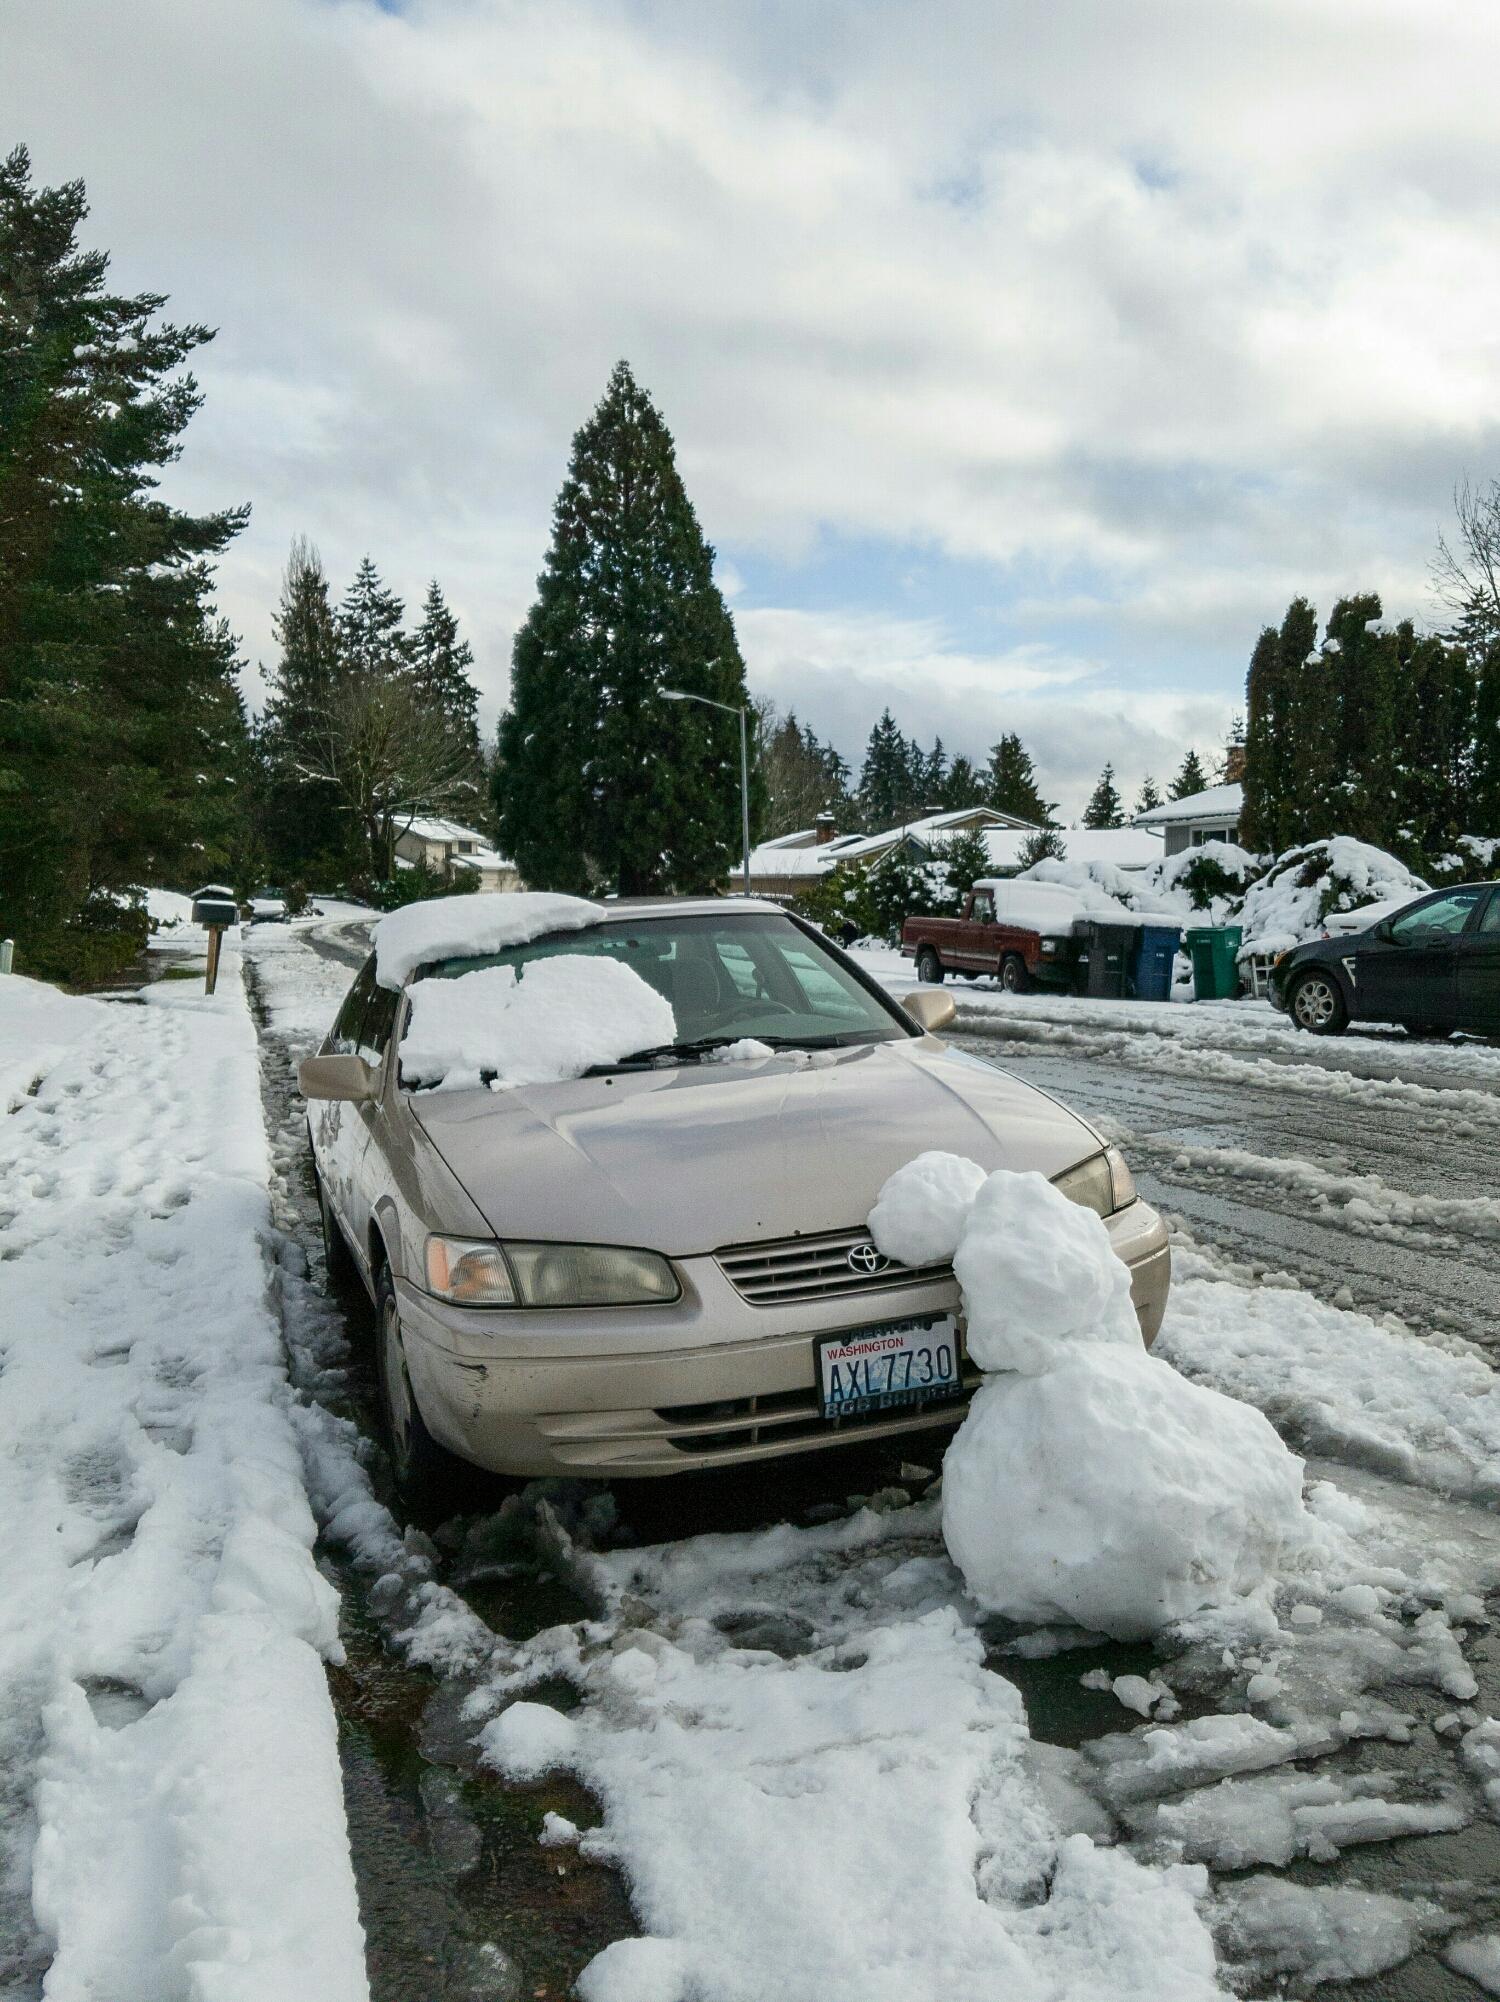 Snowy casualty